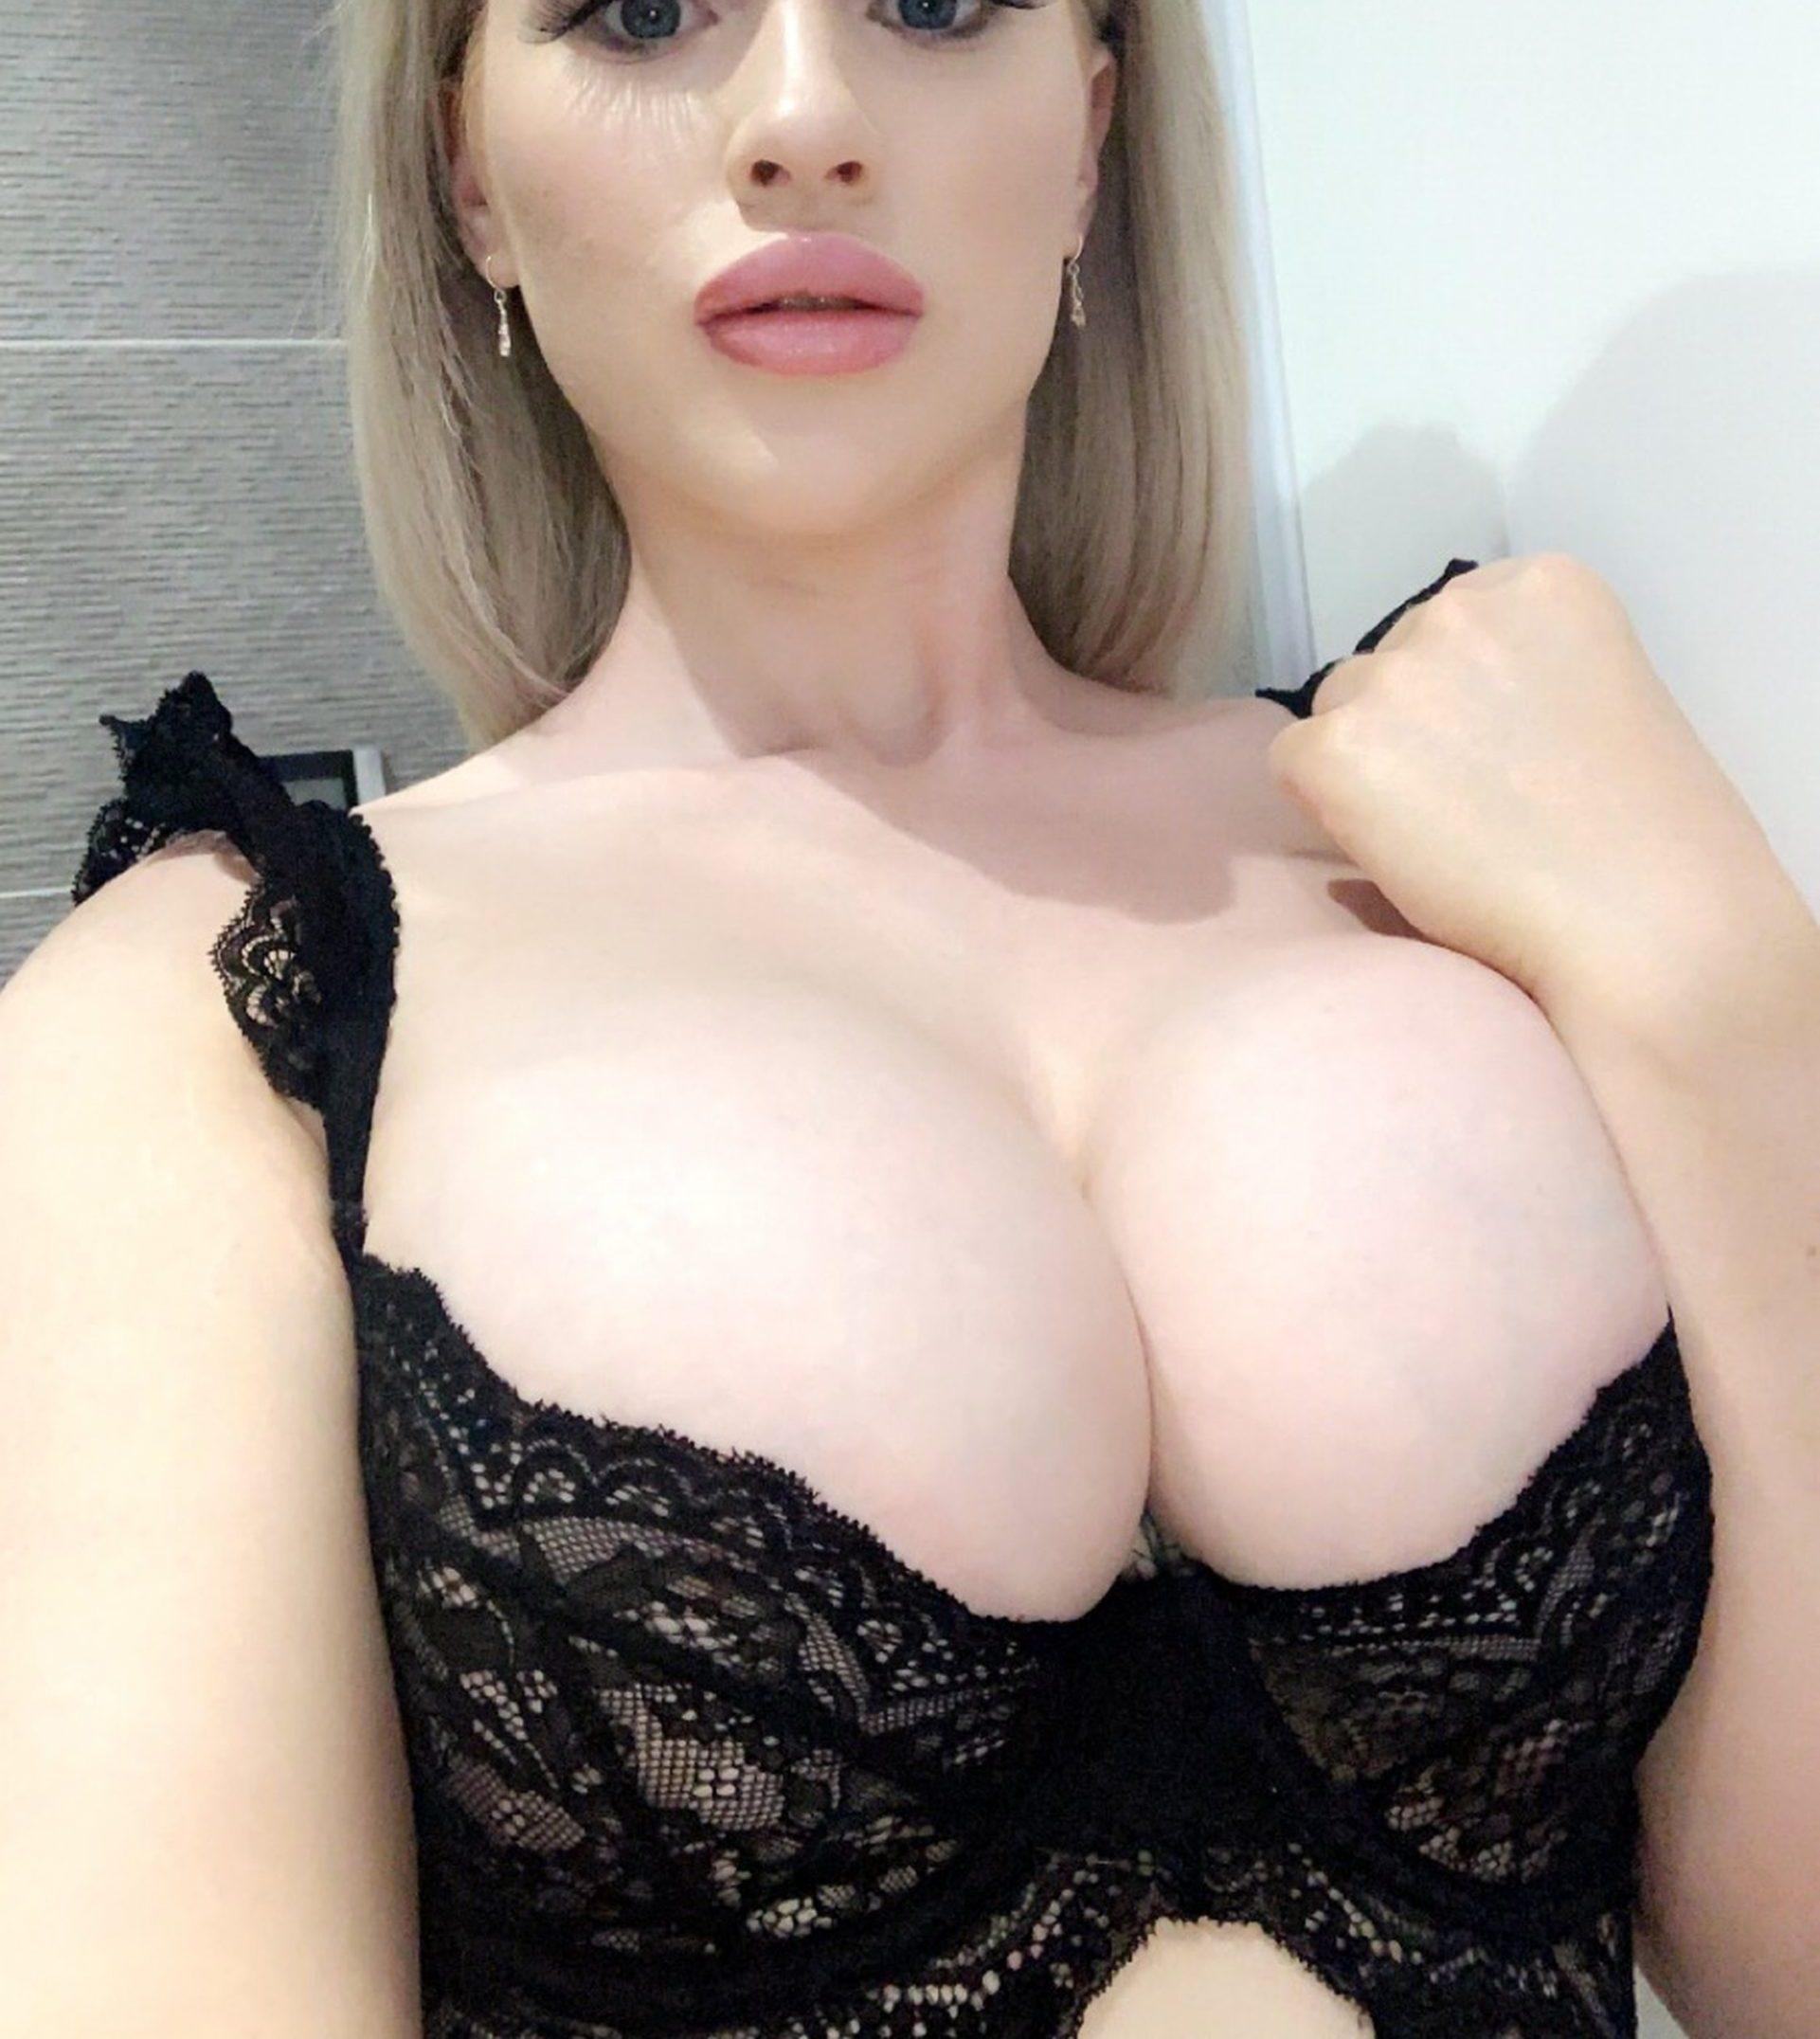 Taylaxo Admireme Nudes Leaks 0009